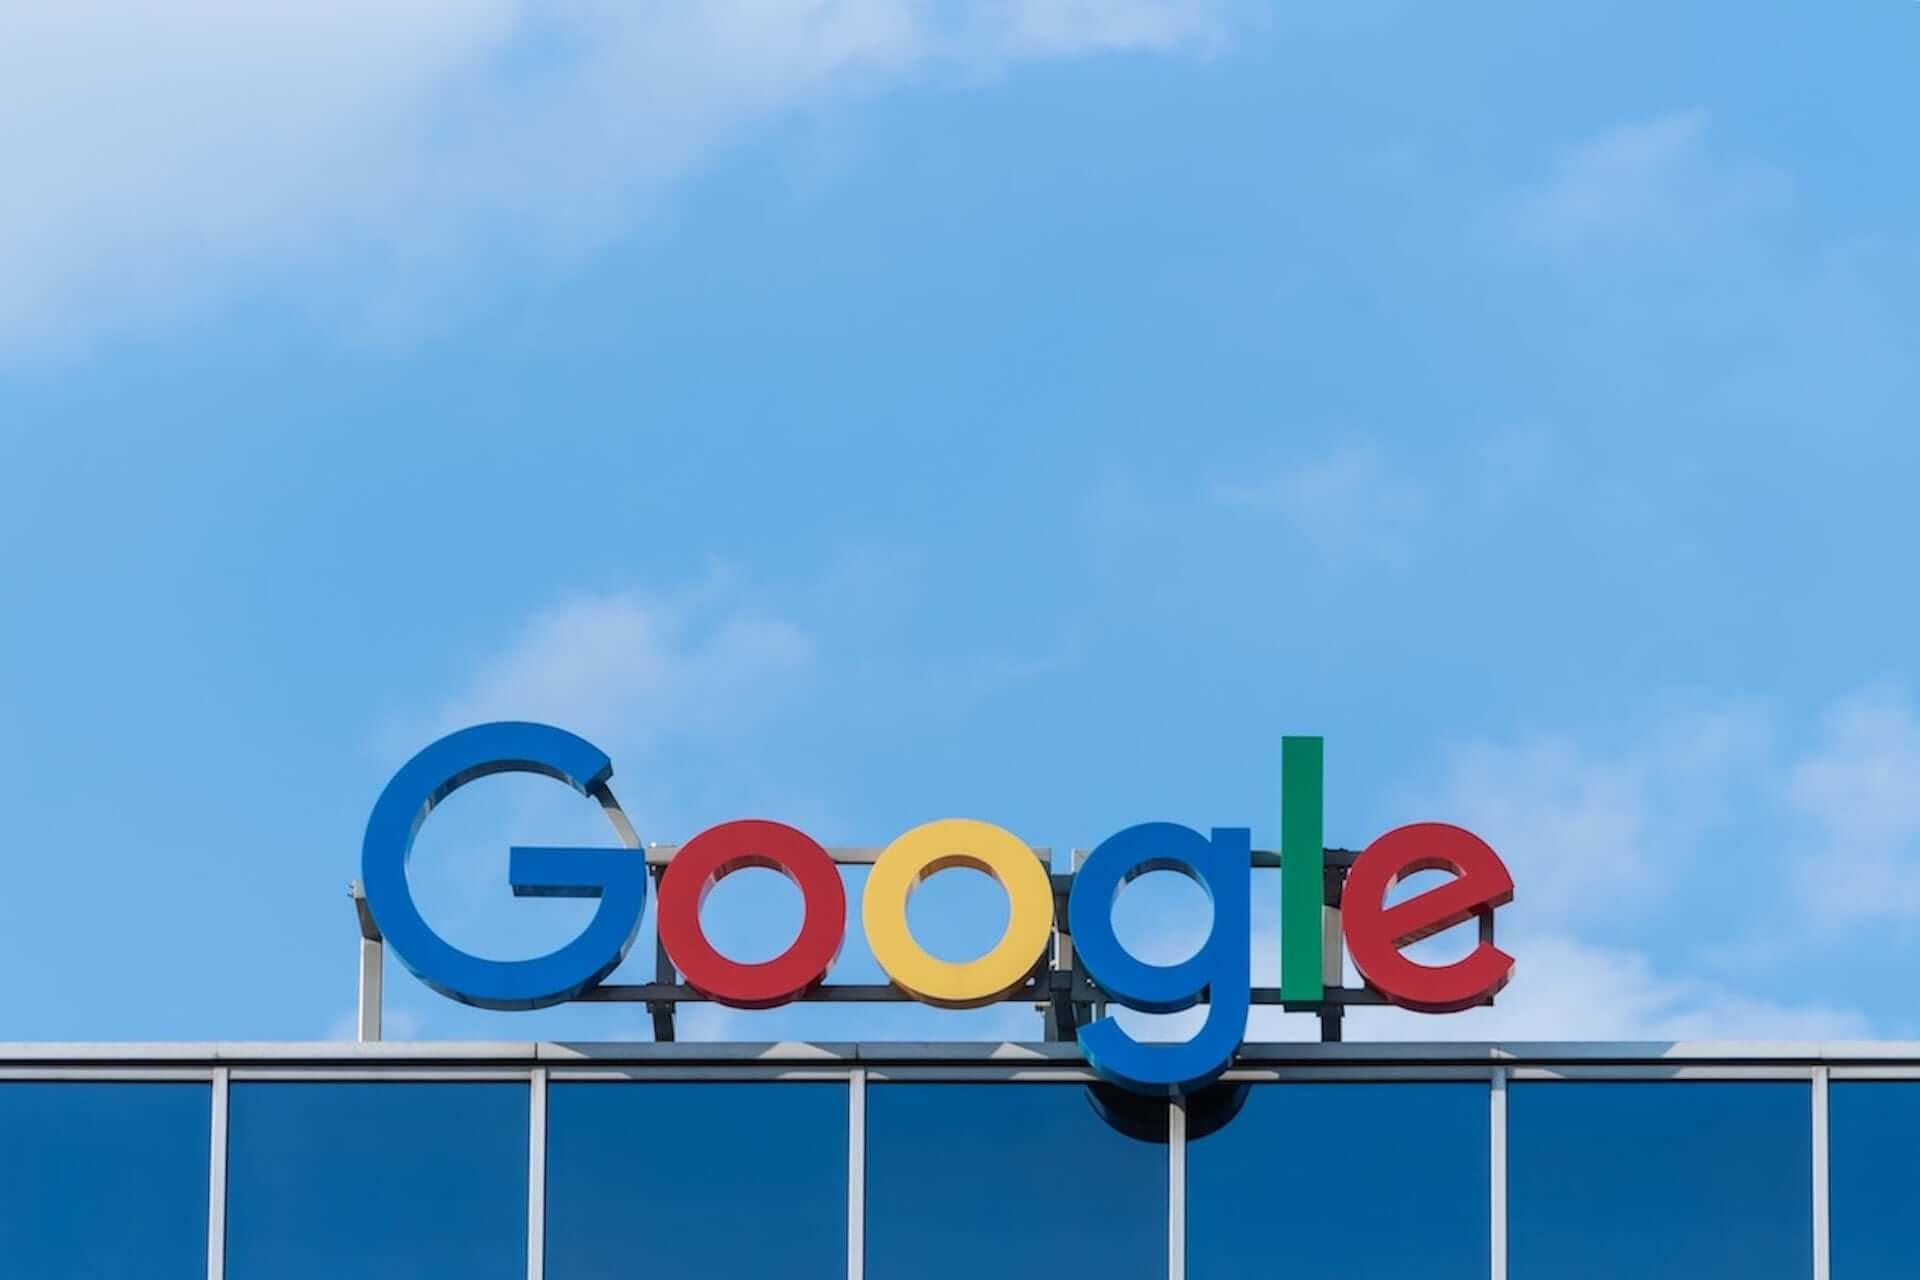 Google、折りたたみ式の「スマートブック」開発に着手? tech190701_google_smartbook_main-1920x1280